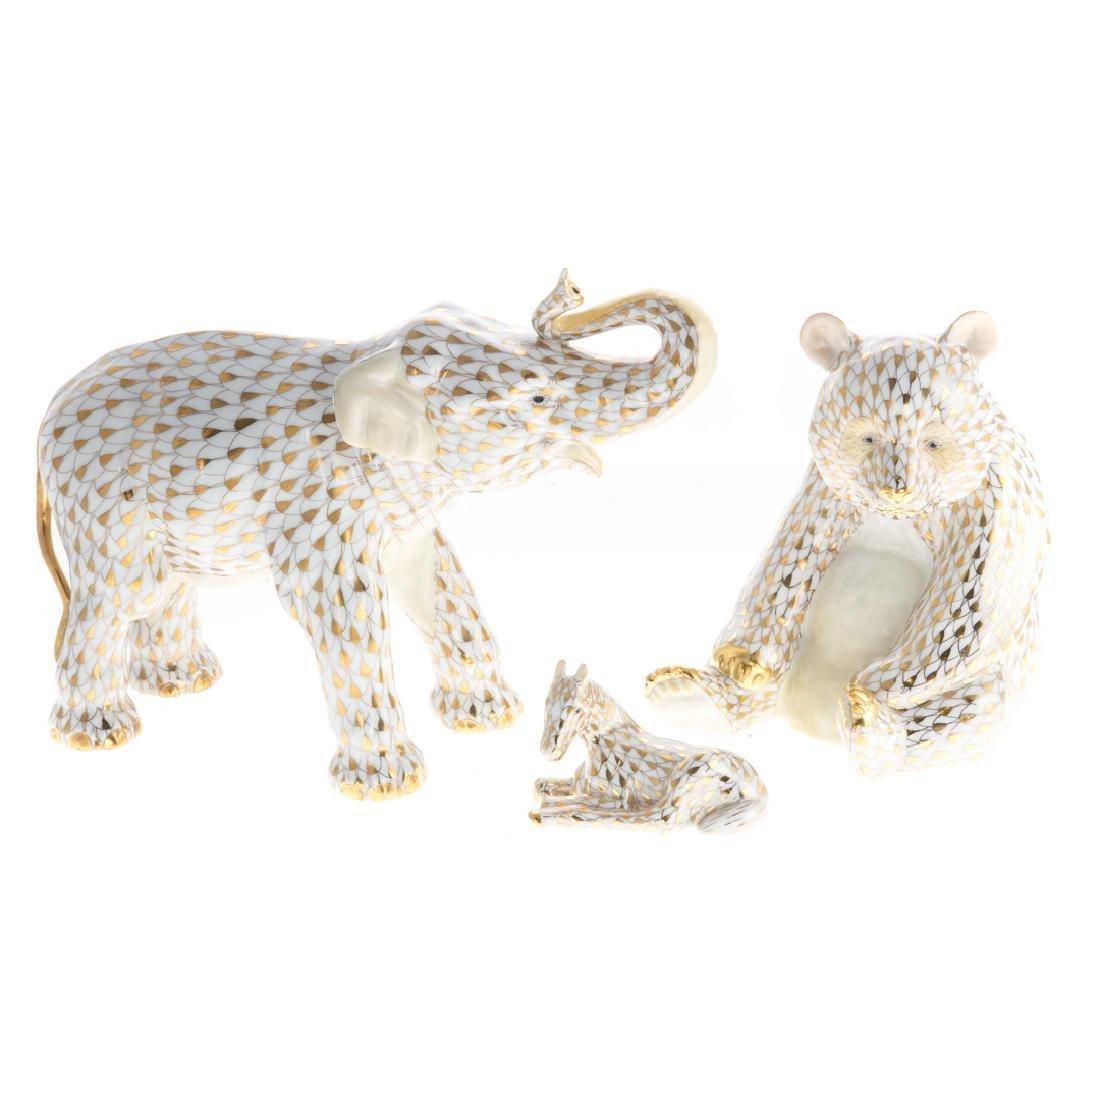 Three Herend porcelain Gold Fishnet animals